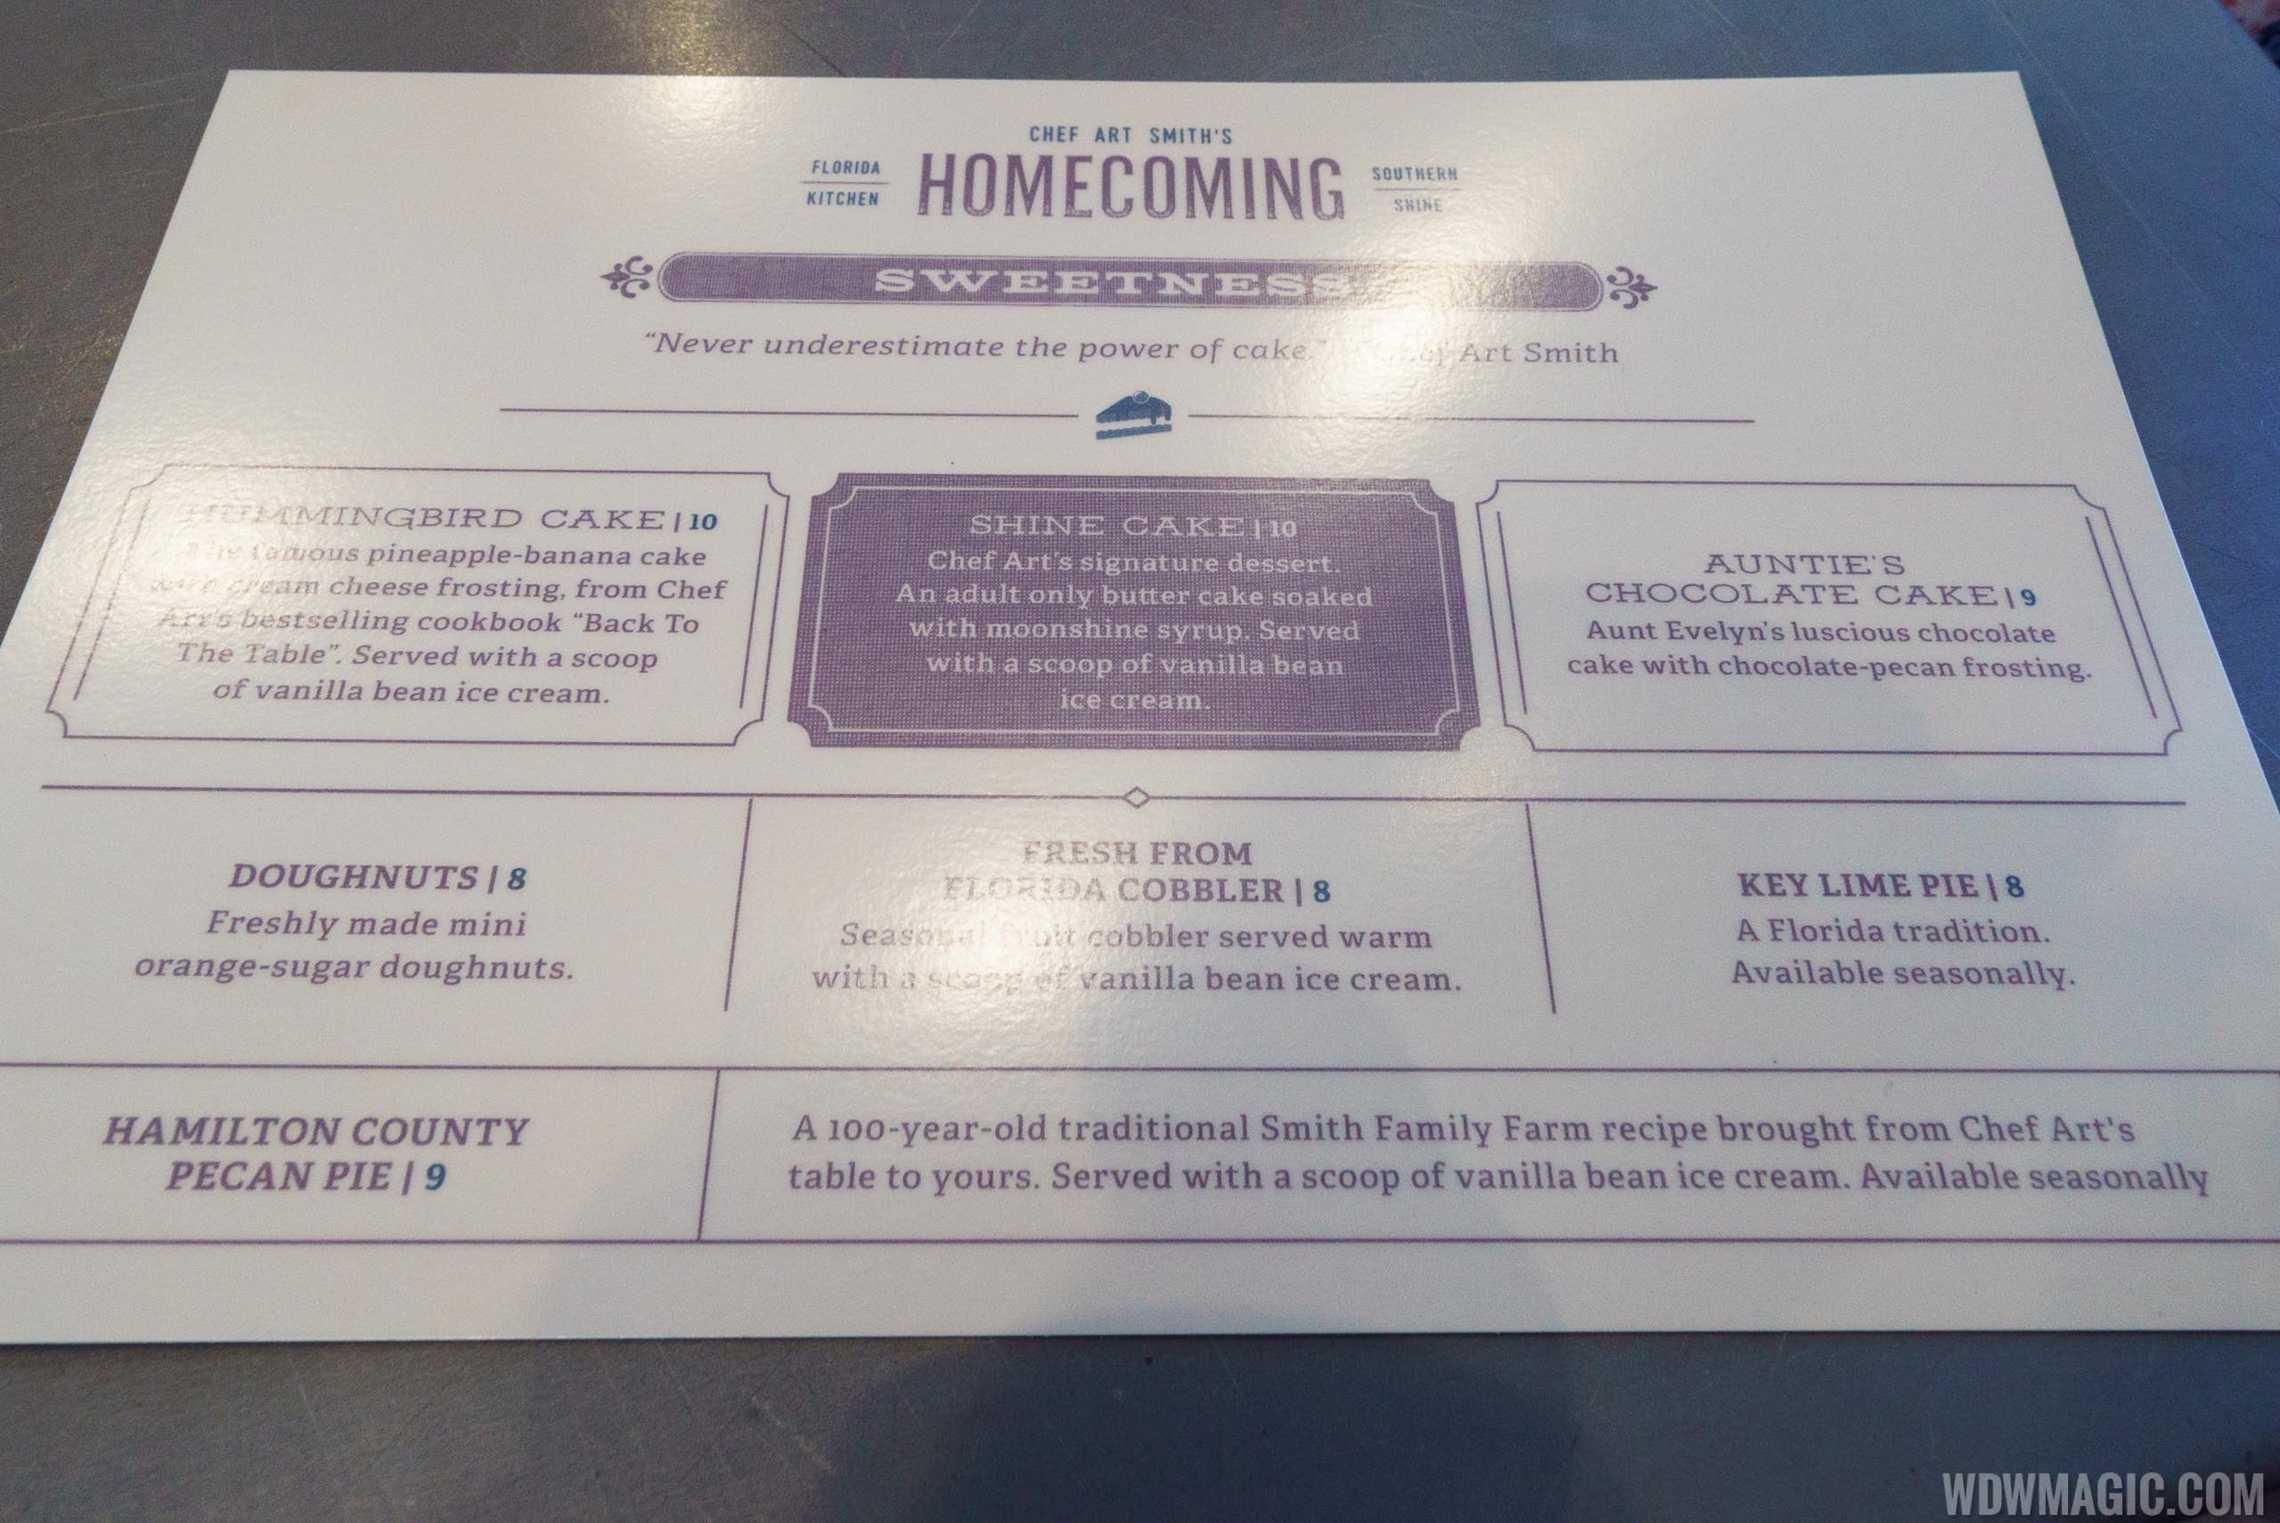 Homecoming restaurant - Dessert menu